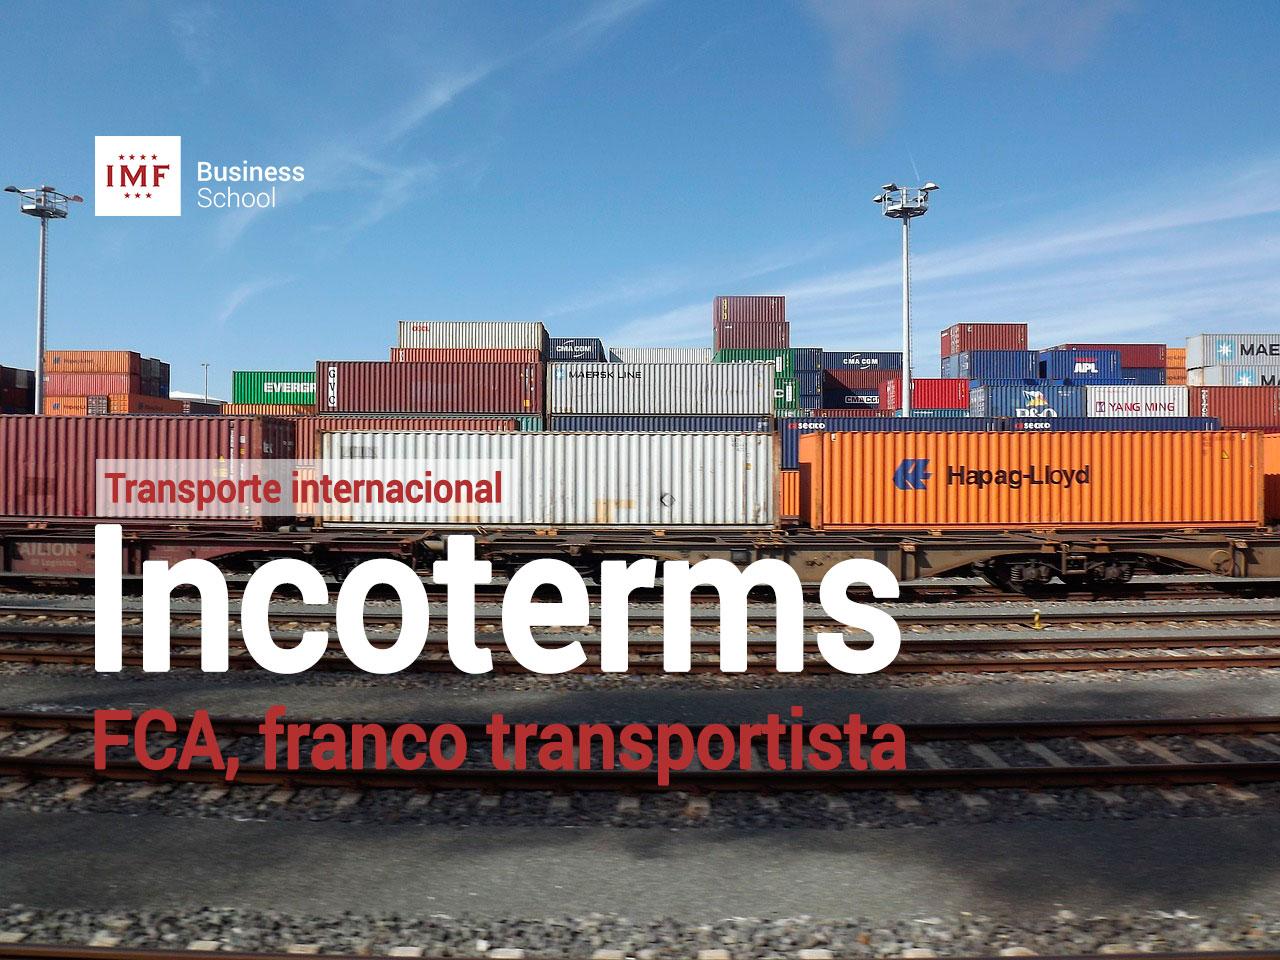 FCA (FREE CARRIER), FRANCO TRANSPORTISTA: UNA ALTERNATIVA INTERESANTE AL EXW QUE AUMENTA